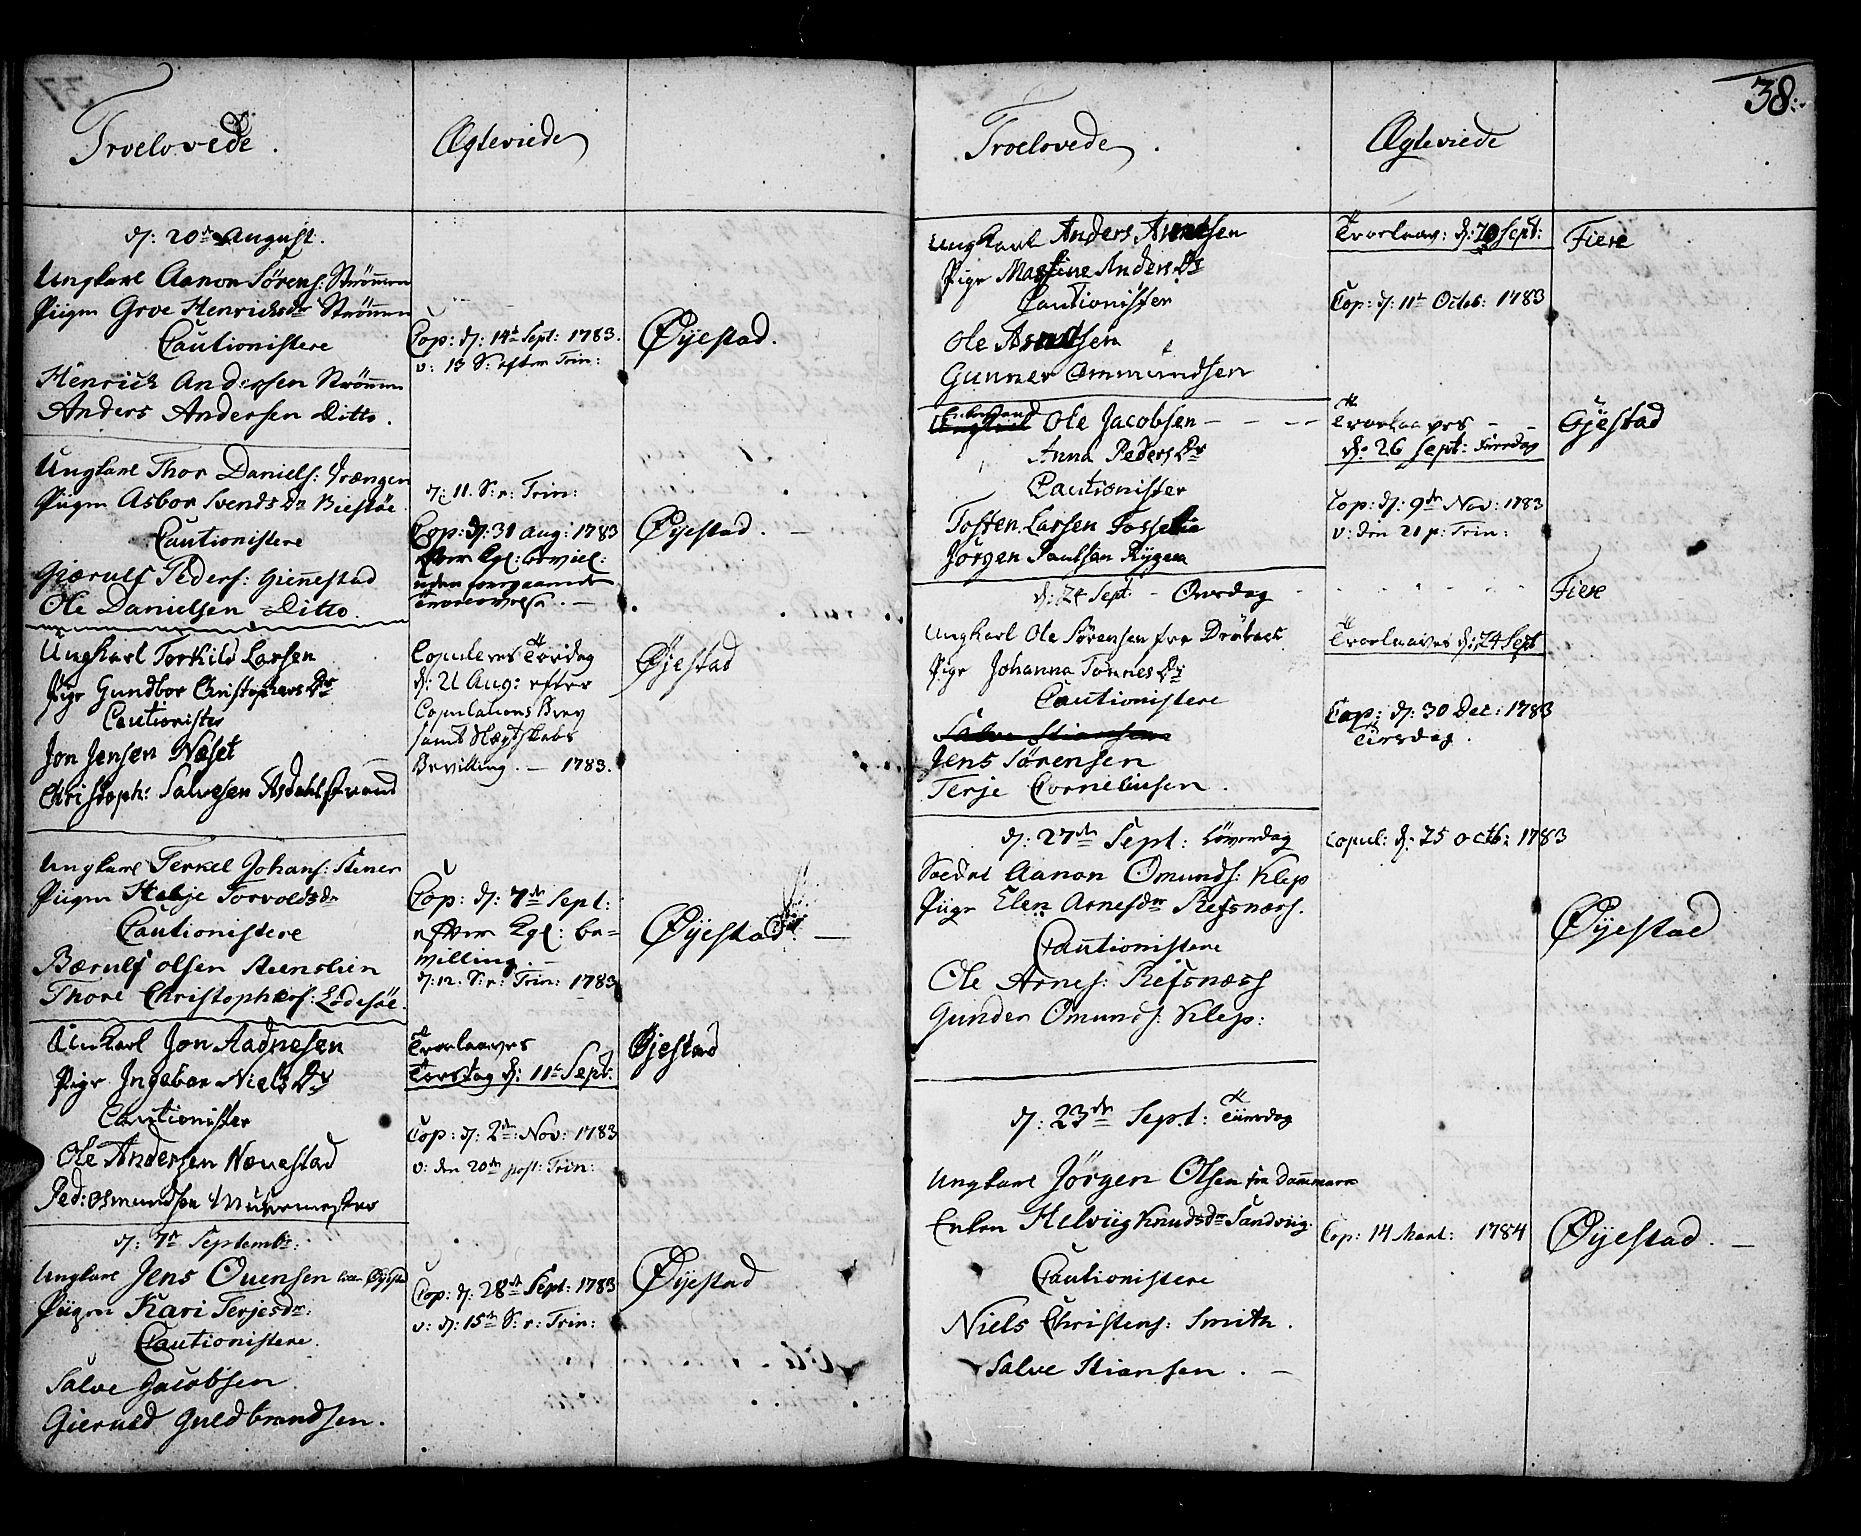 SAK, Øyestad sokneprestkontor, F/Fa/L0009: Ministerialbok nr. A 9, 1778-1808, s. 38